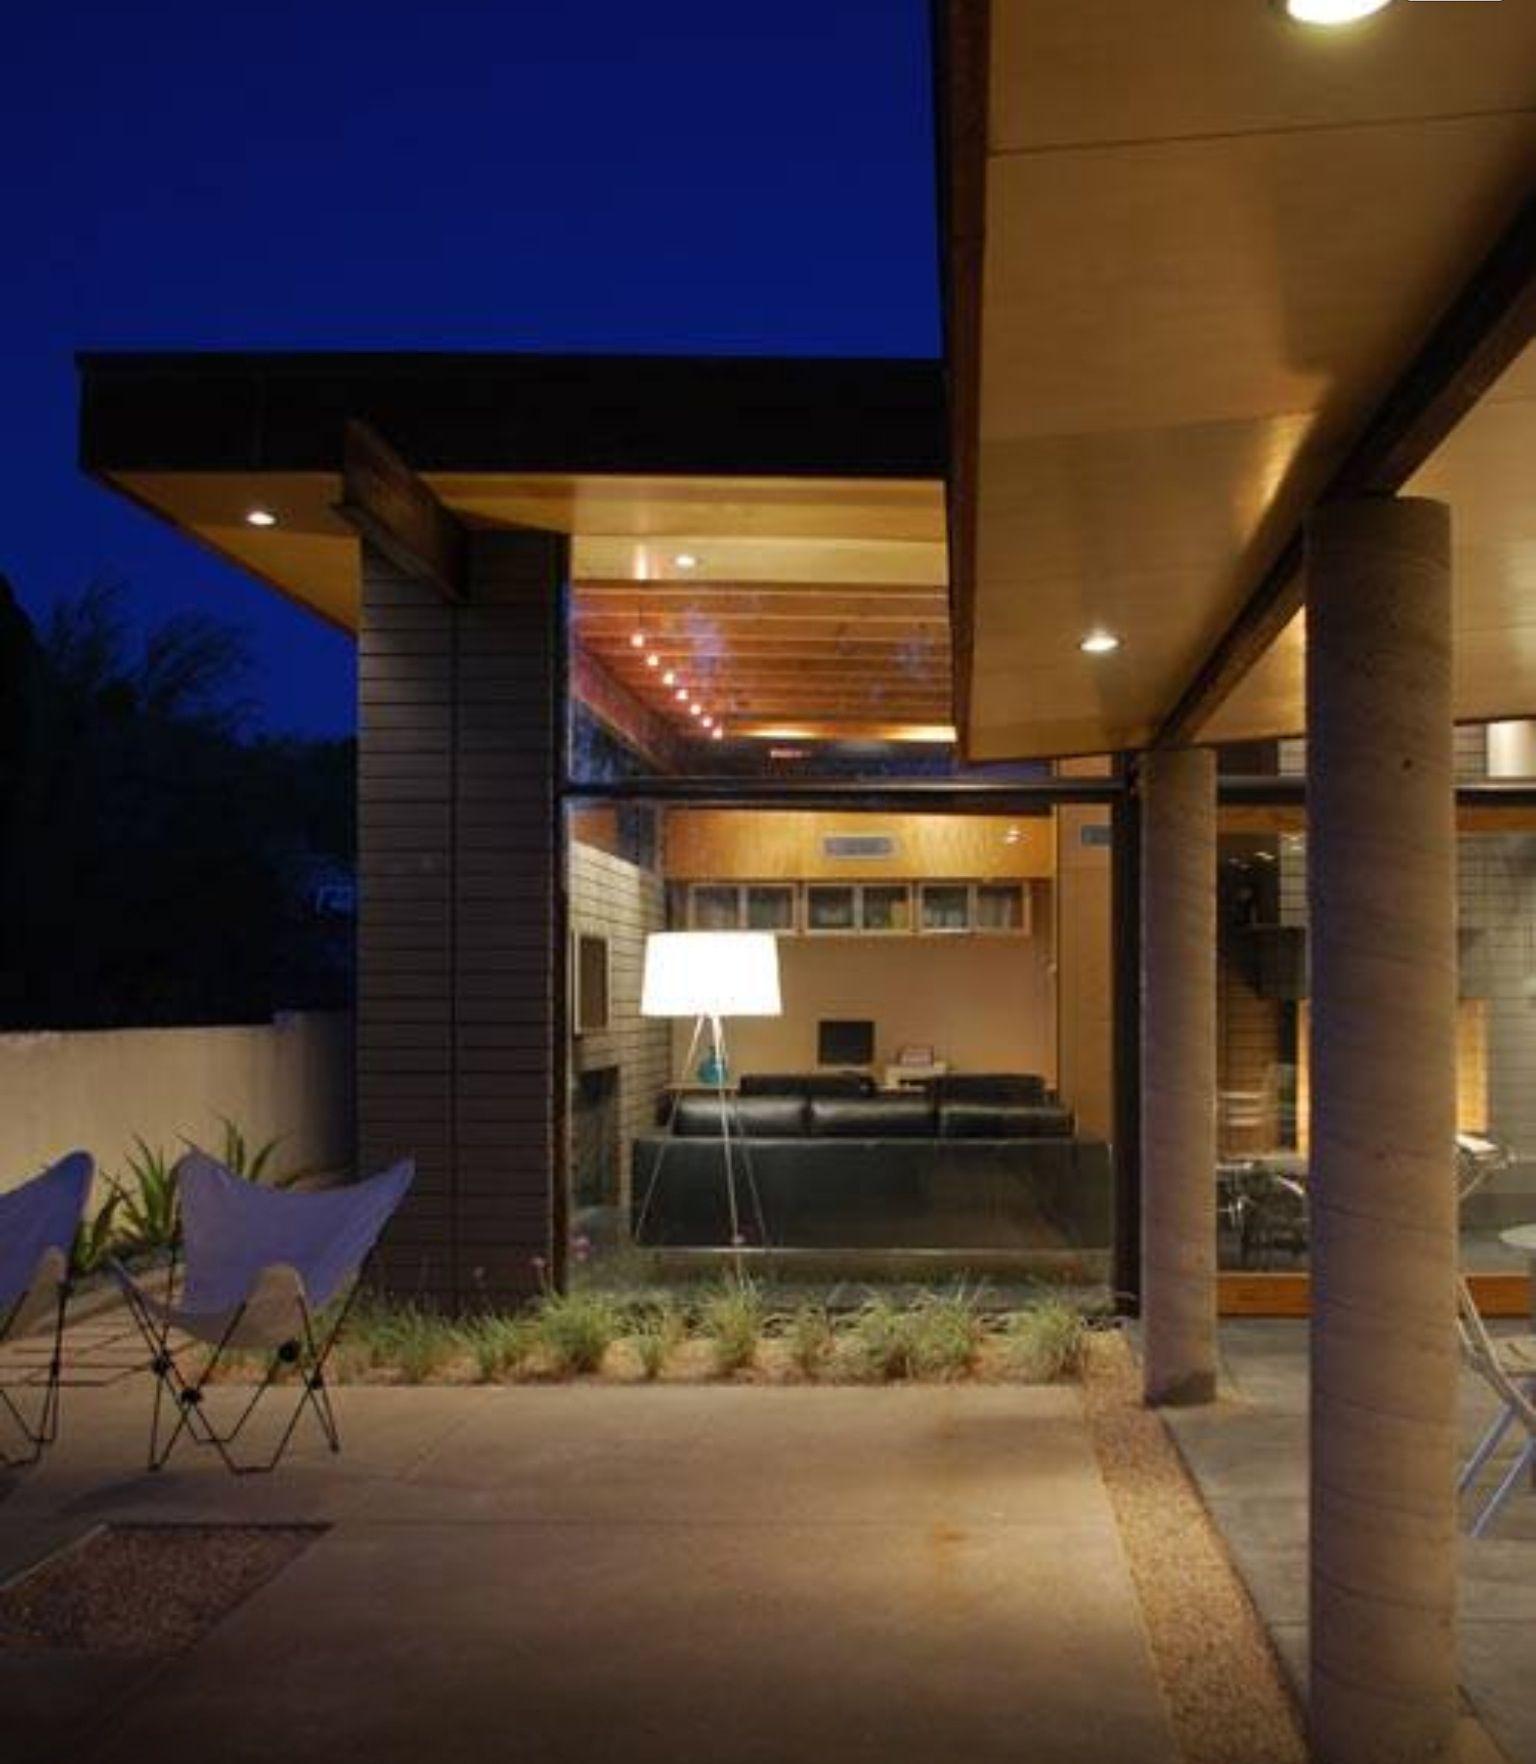 Indoor outdoor lifestyle tucson architecture pinterest